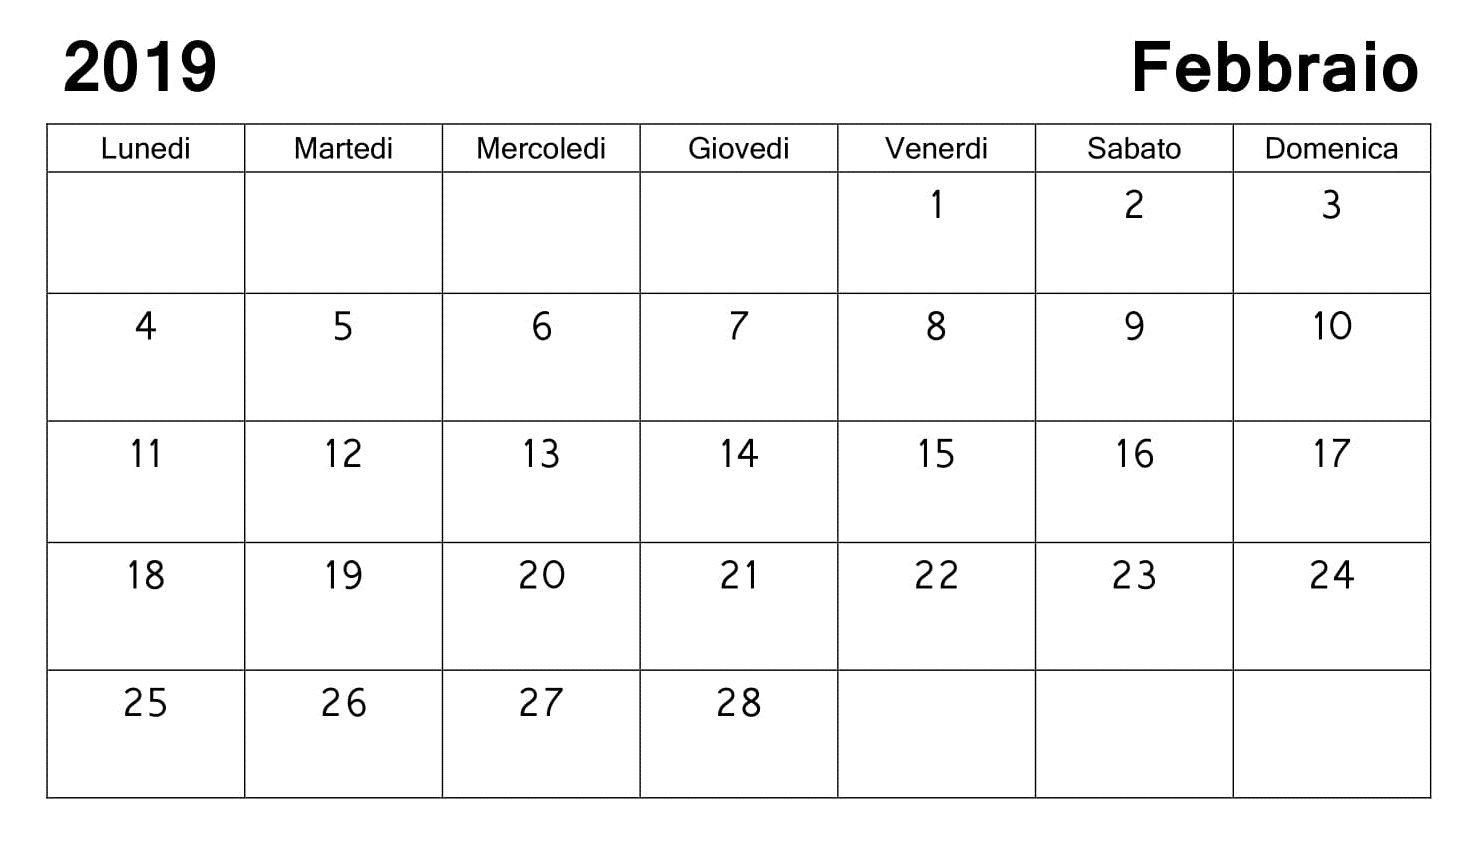 Calendario F2.Febbraio 2019 Calendario 2019 Febbraio Calendario 2019